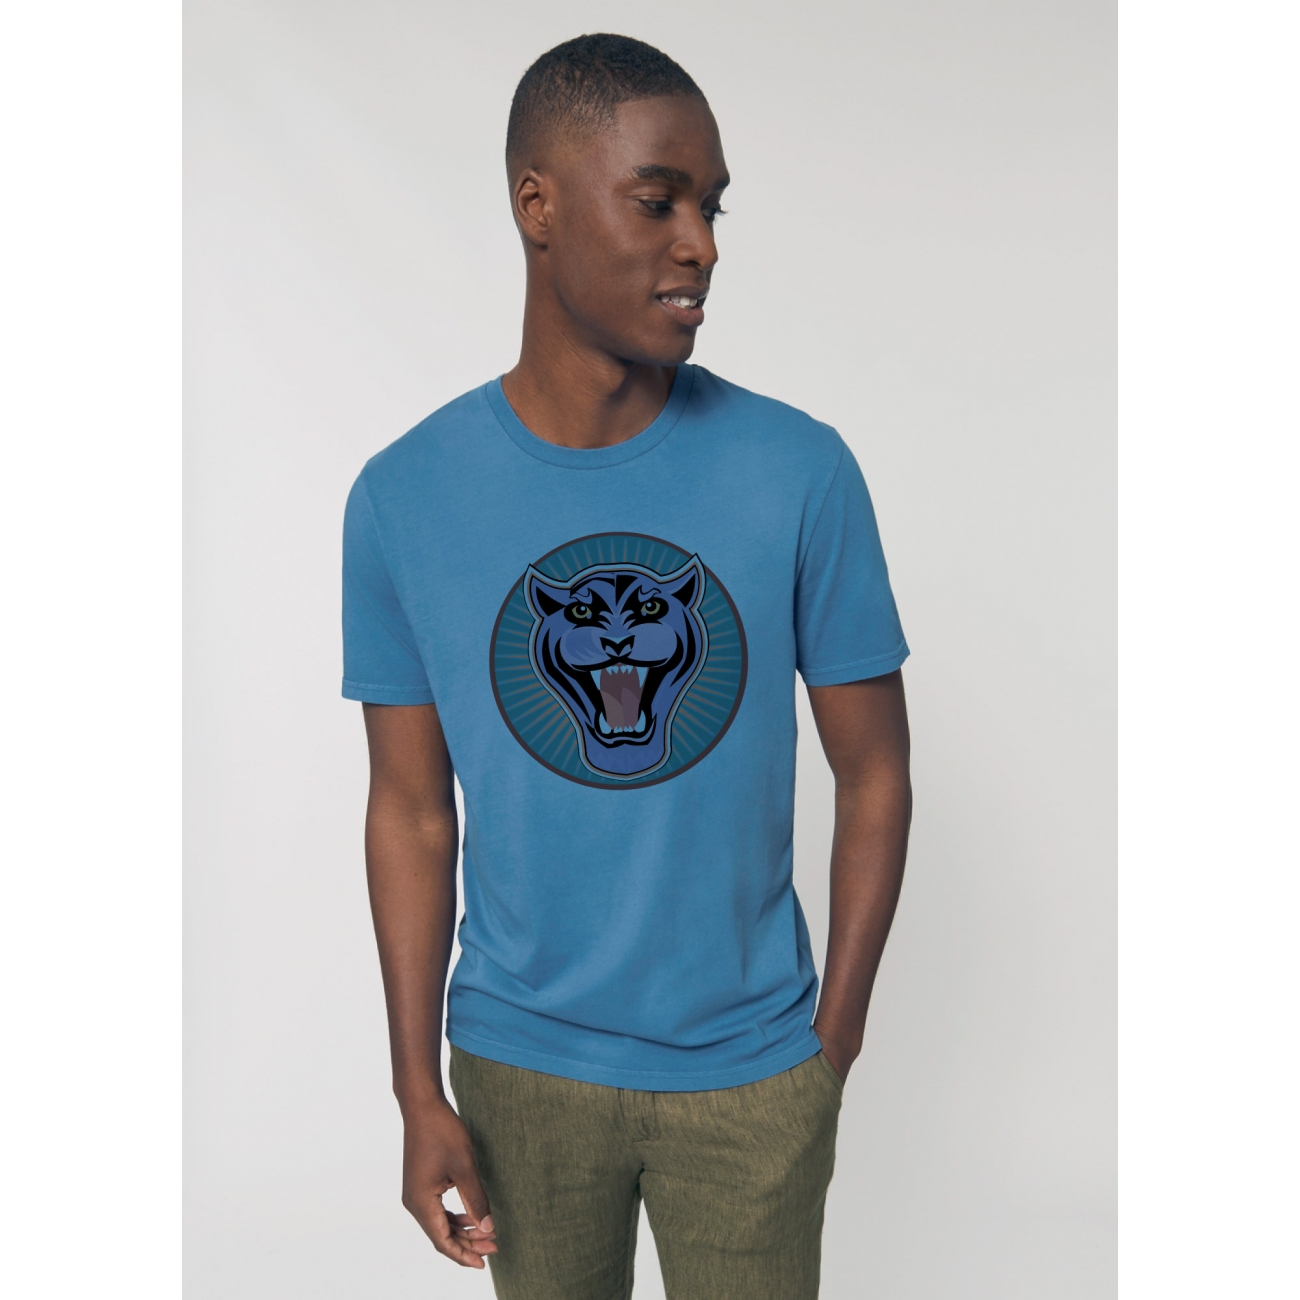 https://tee-shirt-bio.com/8941-thickbox_default/tee-shirt-vieux-bleu-vintage-coton-bio-homme-impression-panthere.jpg